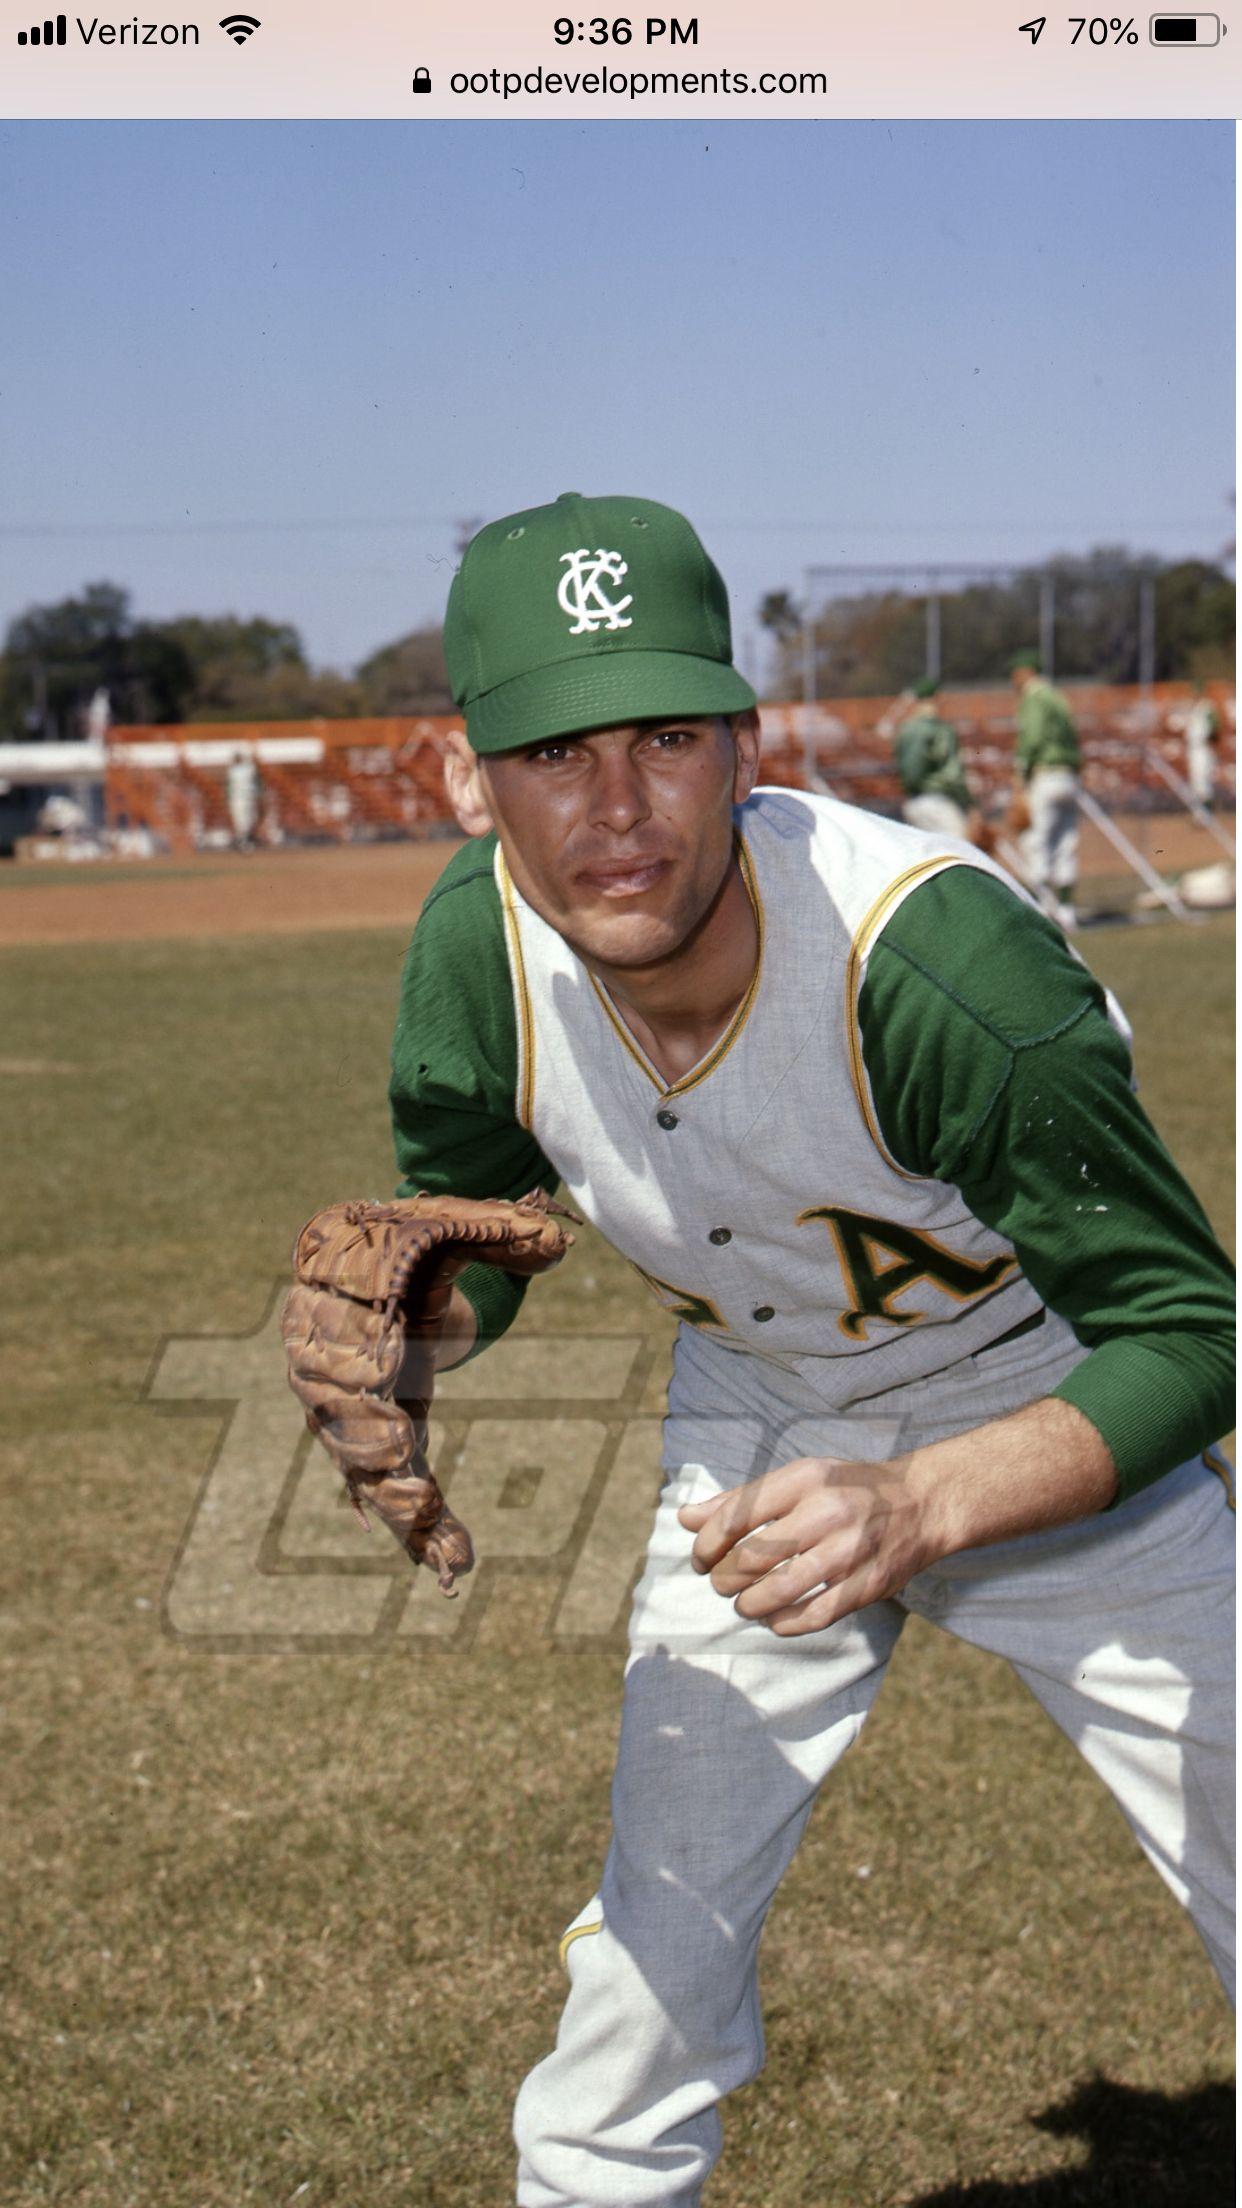 Pin By Maynman On Cutoff A S Misc Baseball Photography Mlb Uniforms Baseball Uniforms